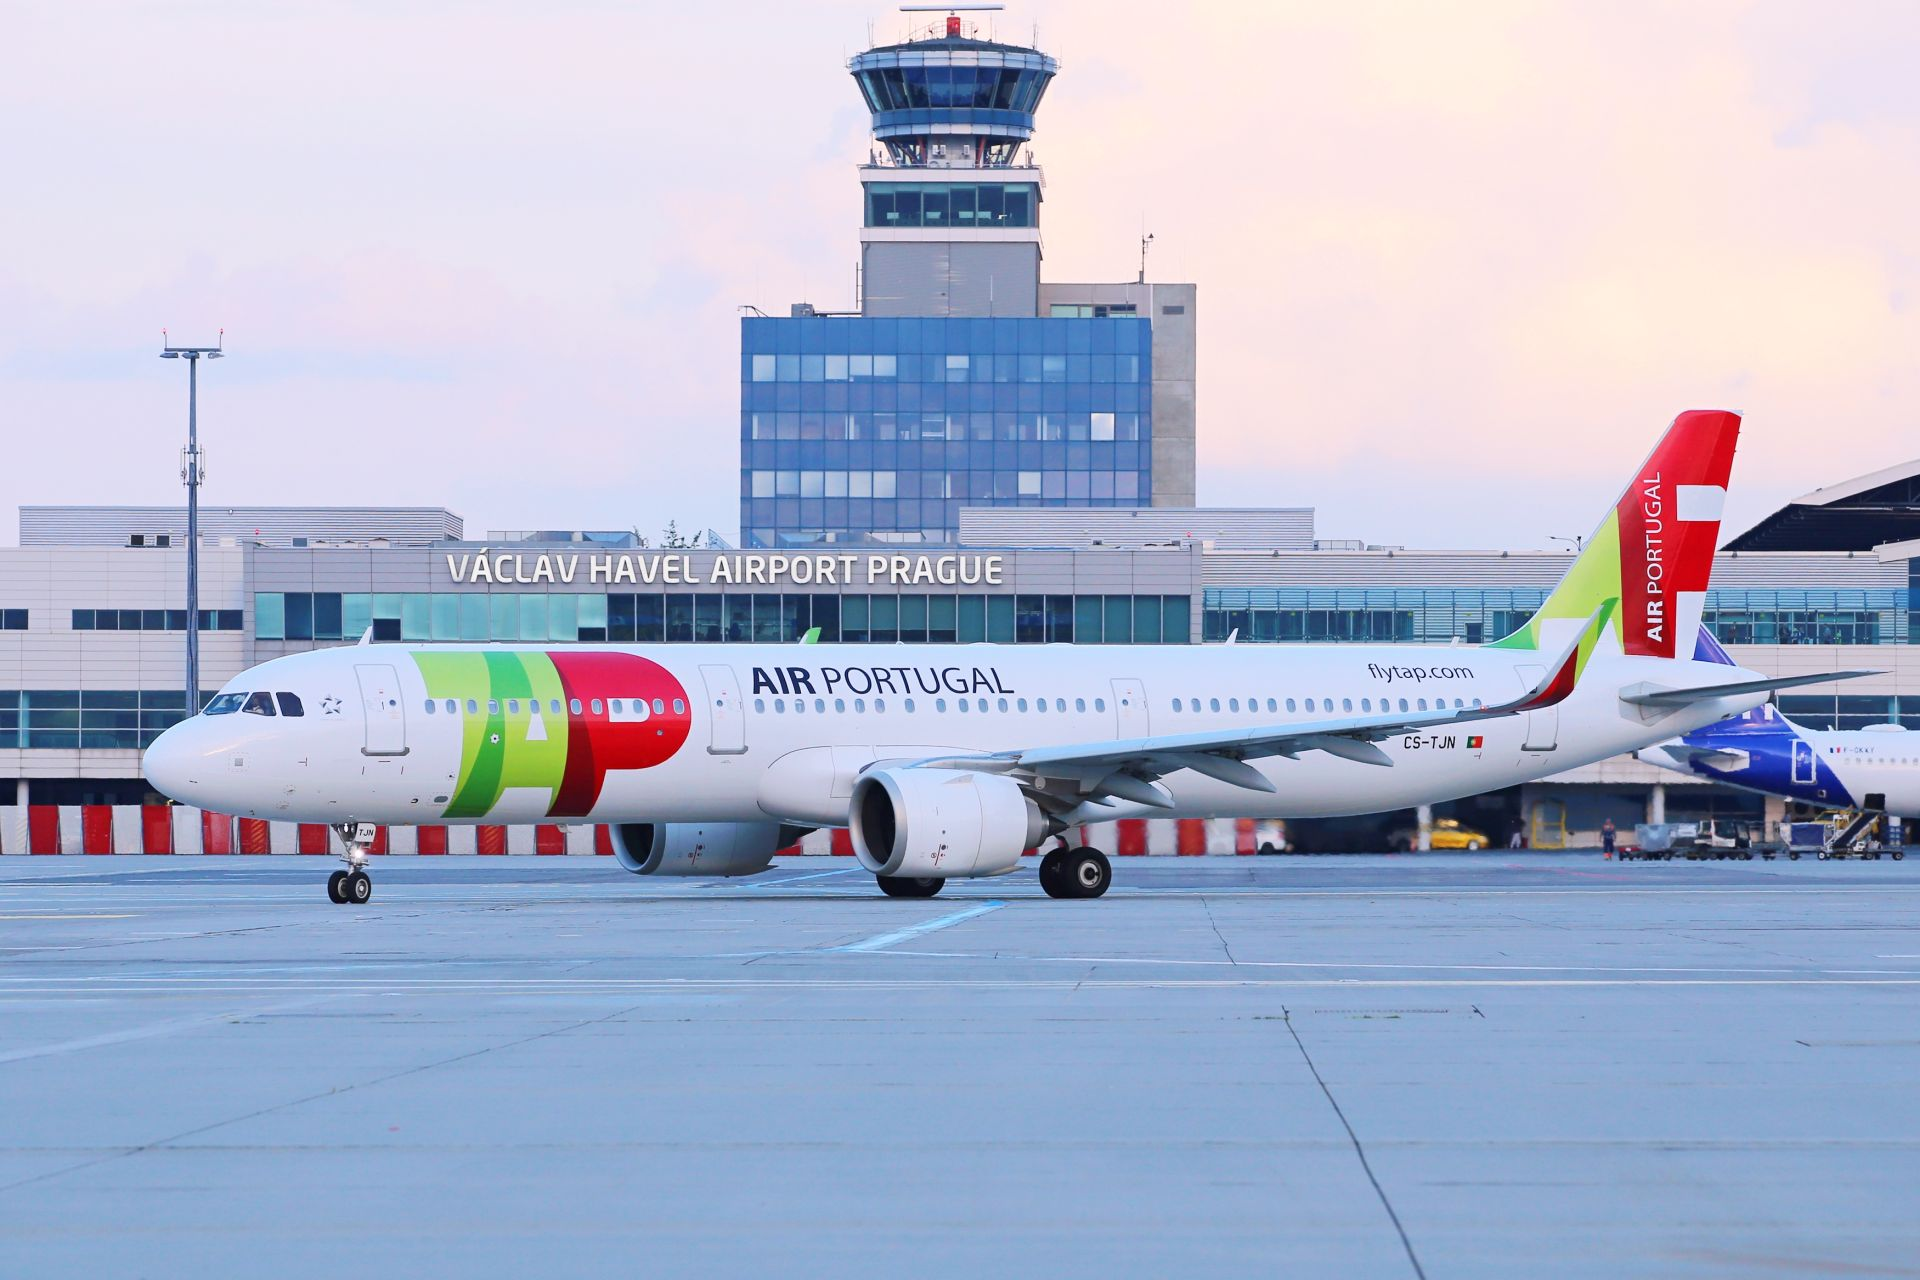 Letadlo TAP Air Portugal v Praze. Pramen: Letiště Praha